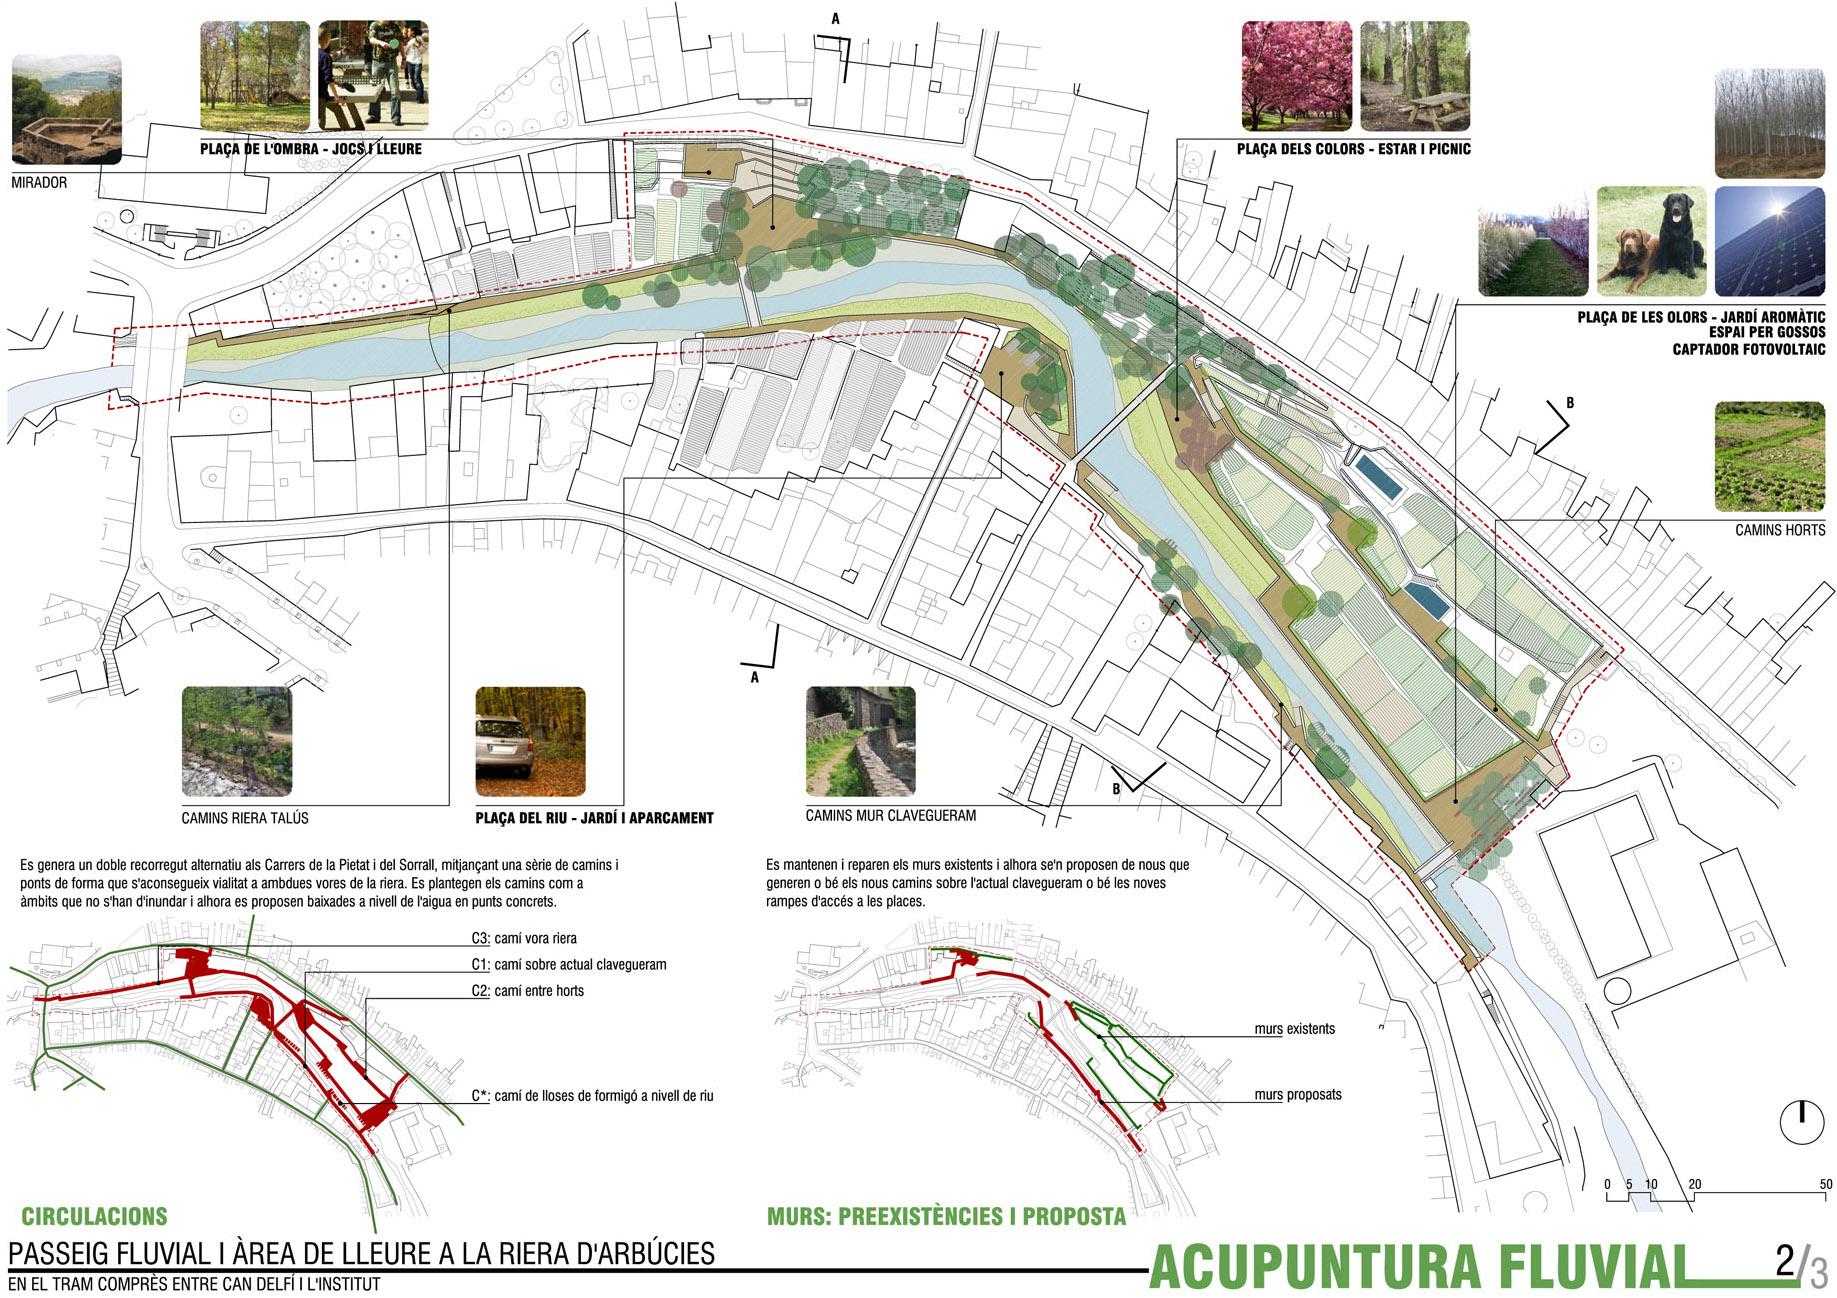 GI001_ACUPUNTURA_FLUVIAL_P02-2